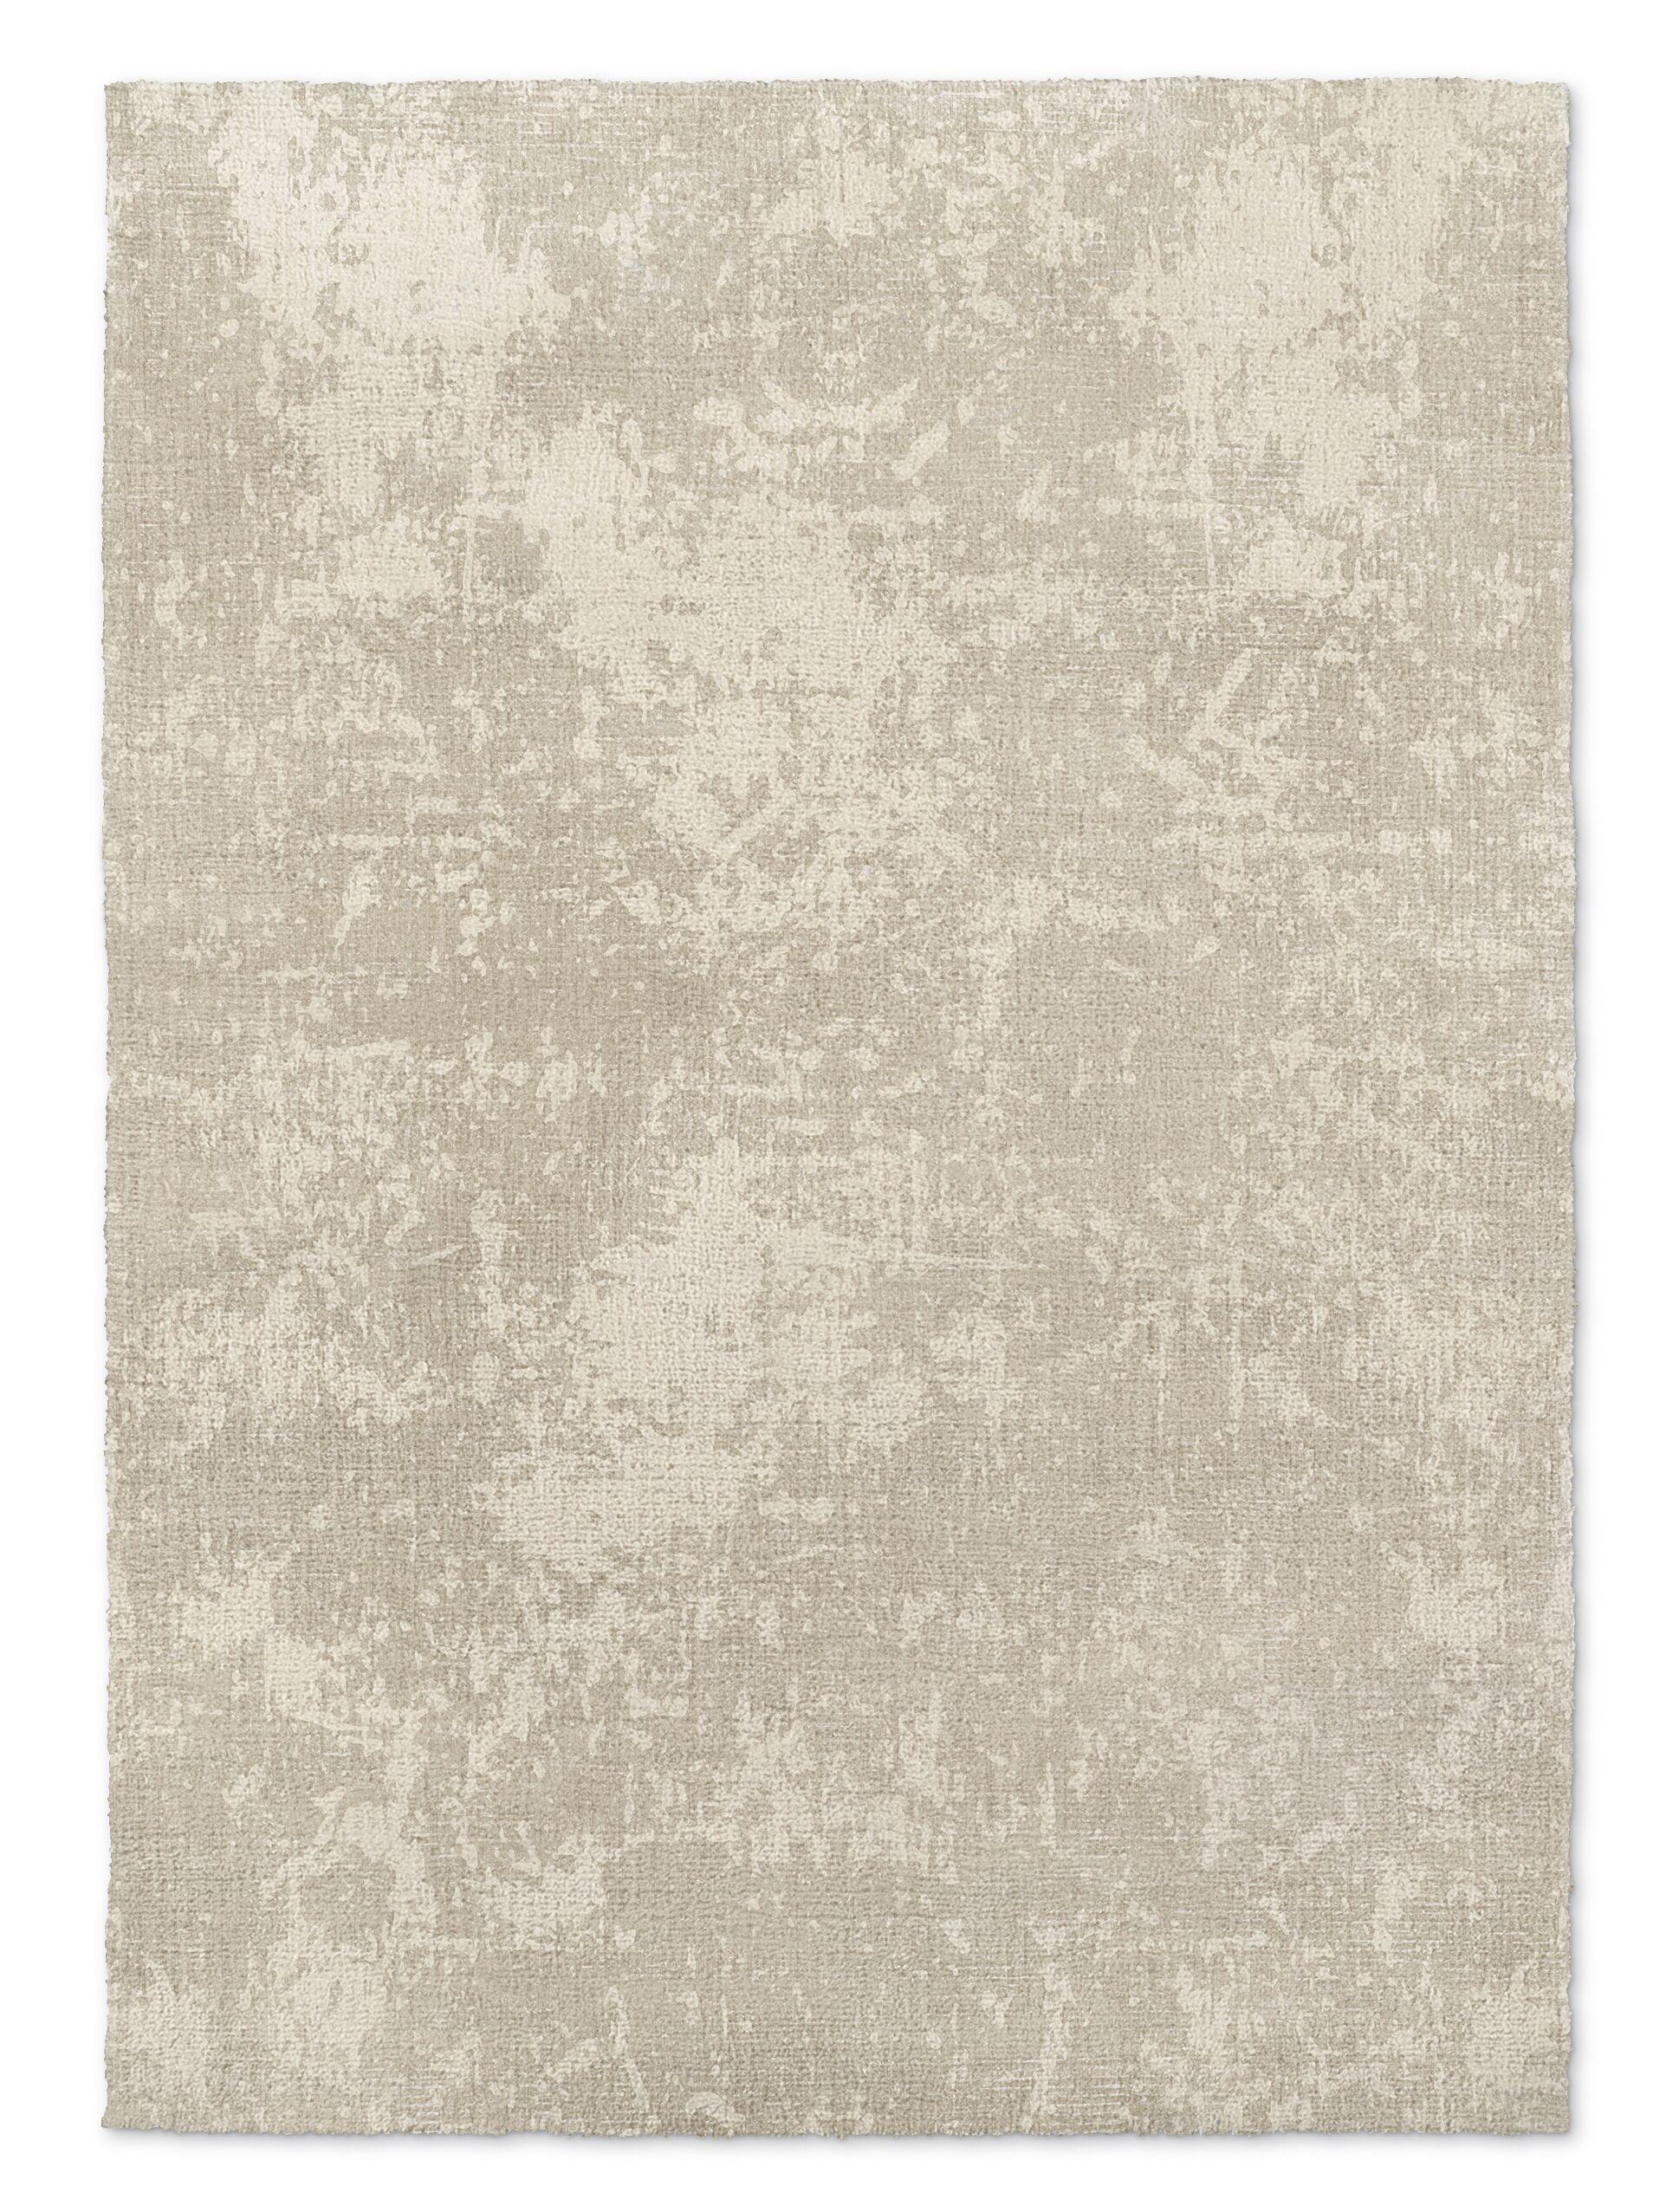 Sarnia Beige Area Rug Rug Size: Rectangle 3' x 5'